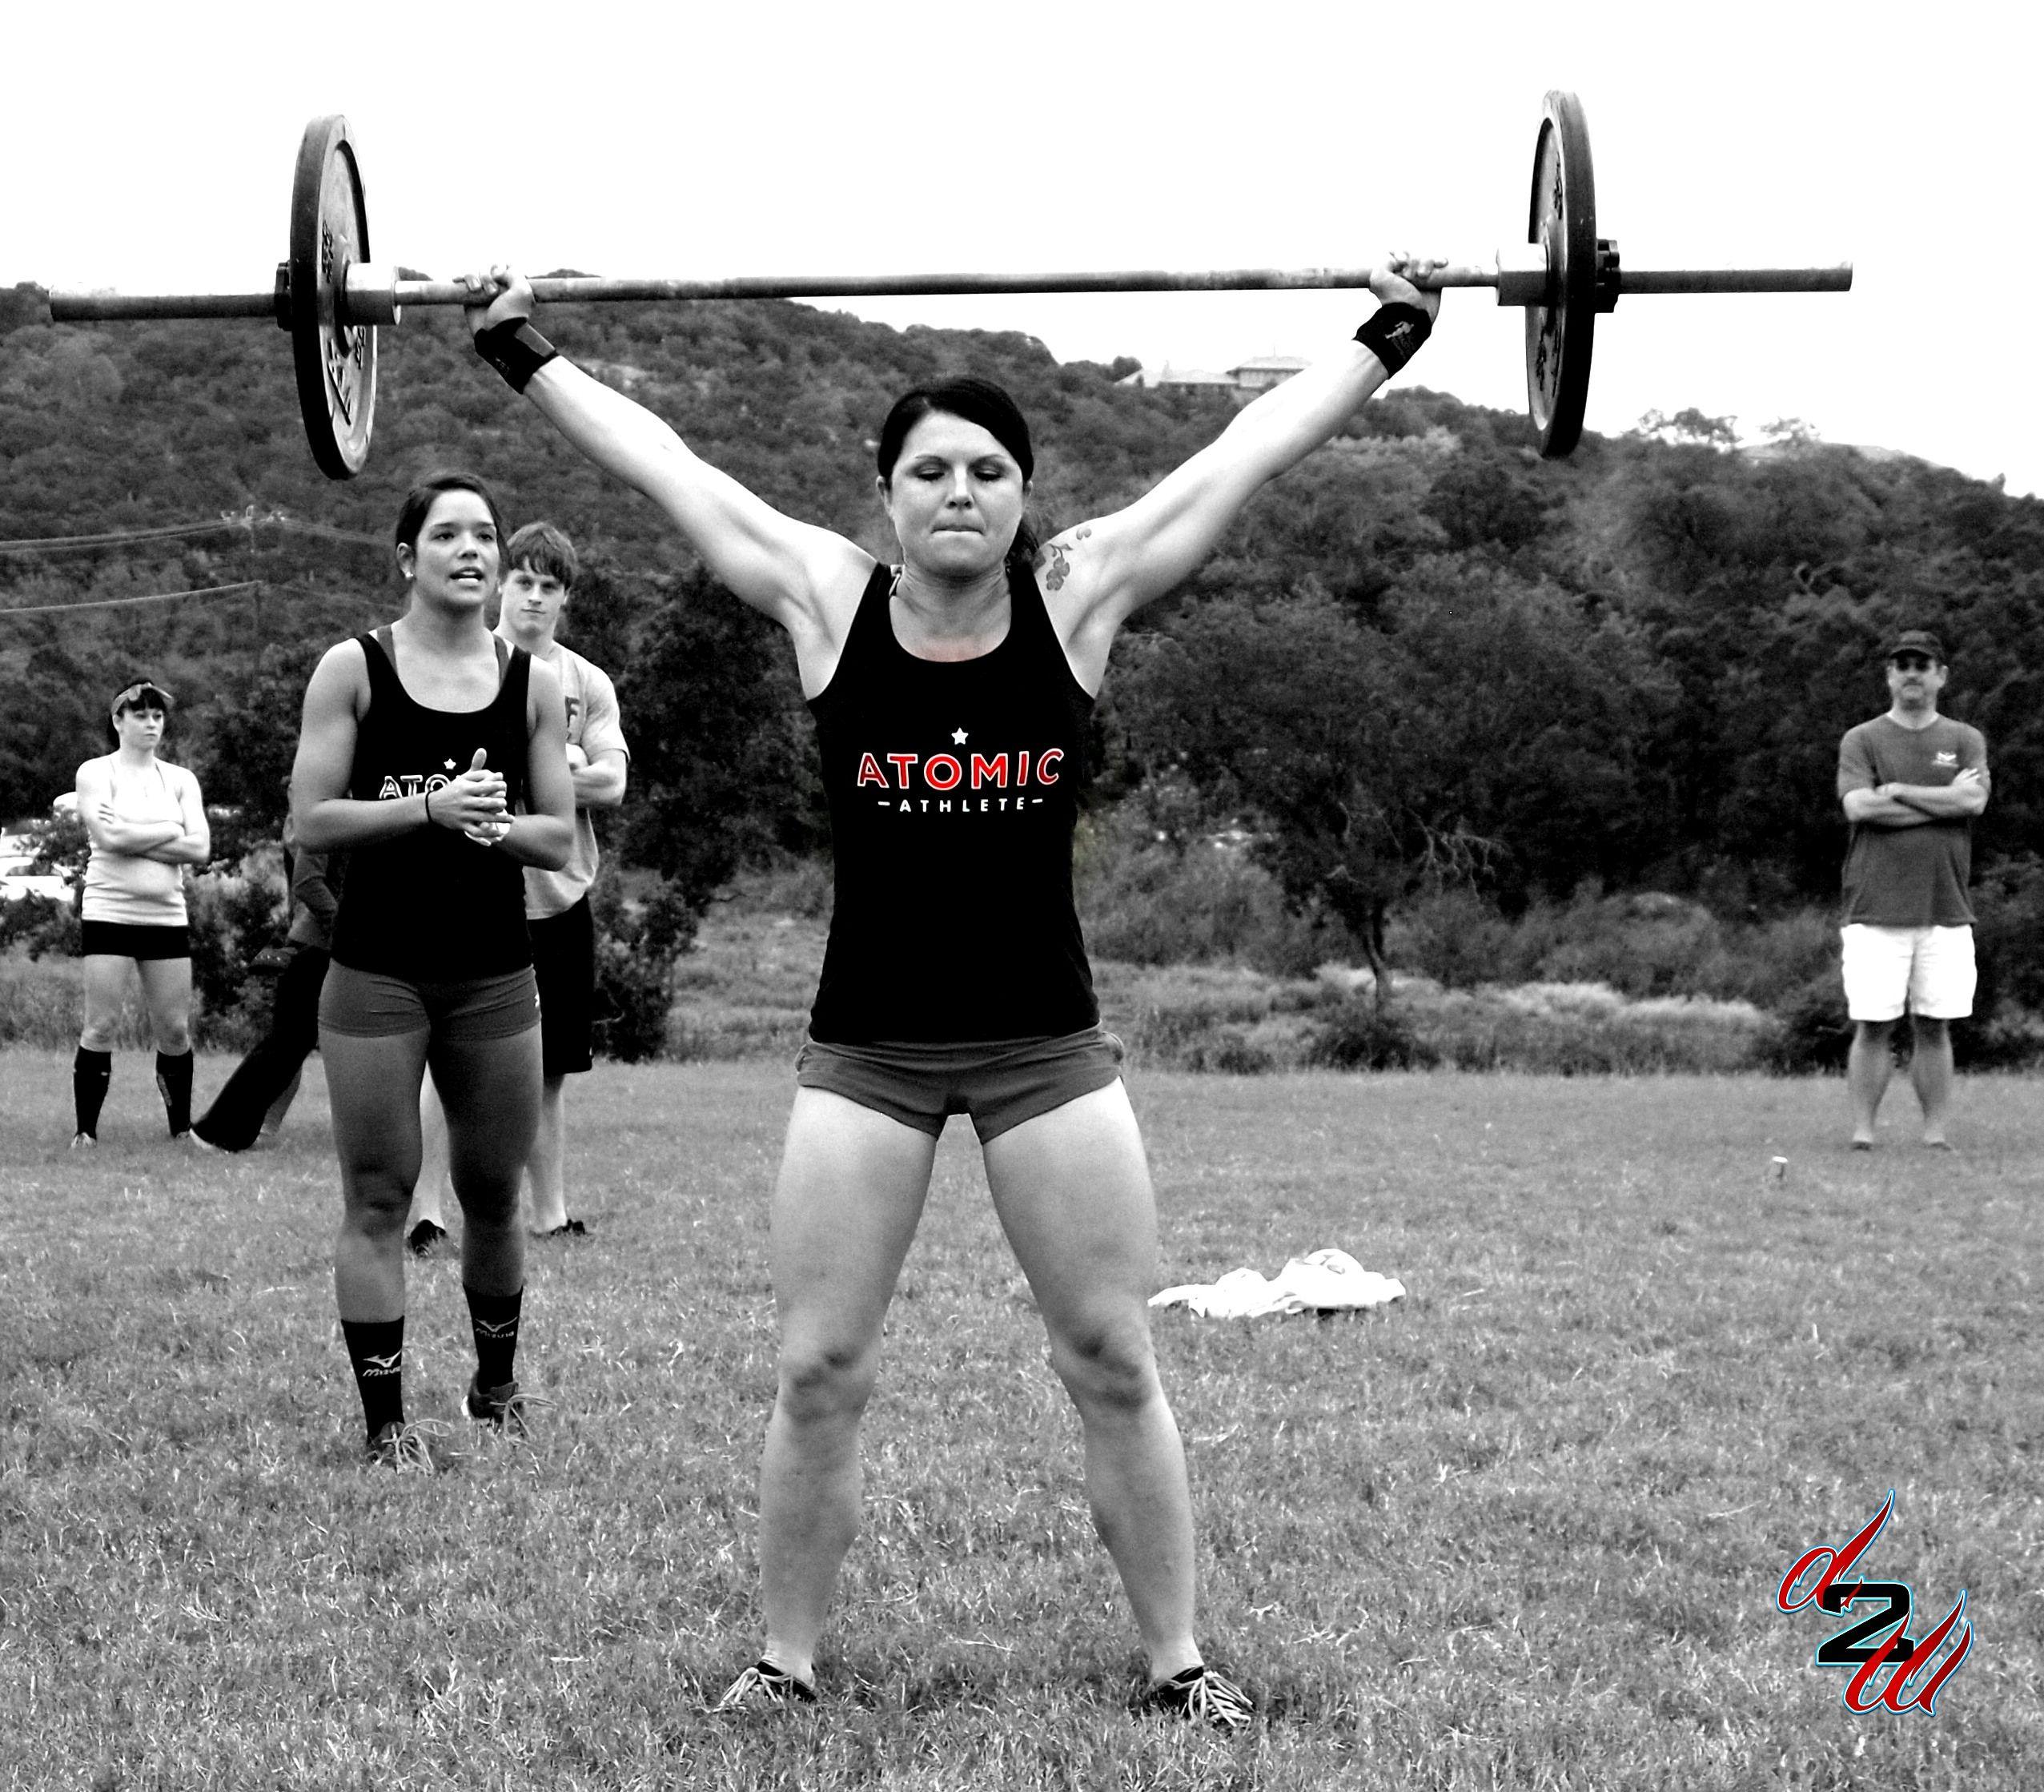 Like A Boss Atomic Athlete Crossfit Girls Fitness Motivation